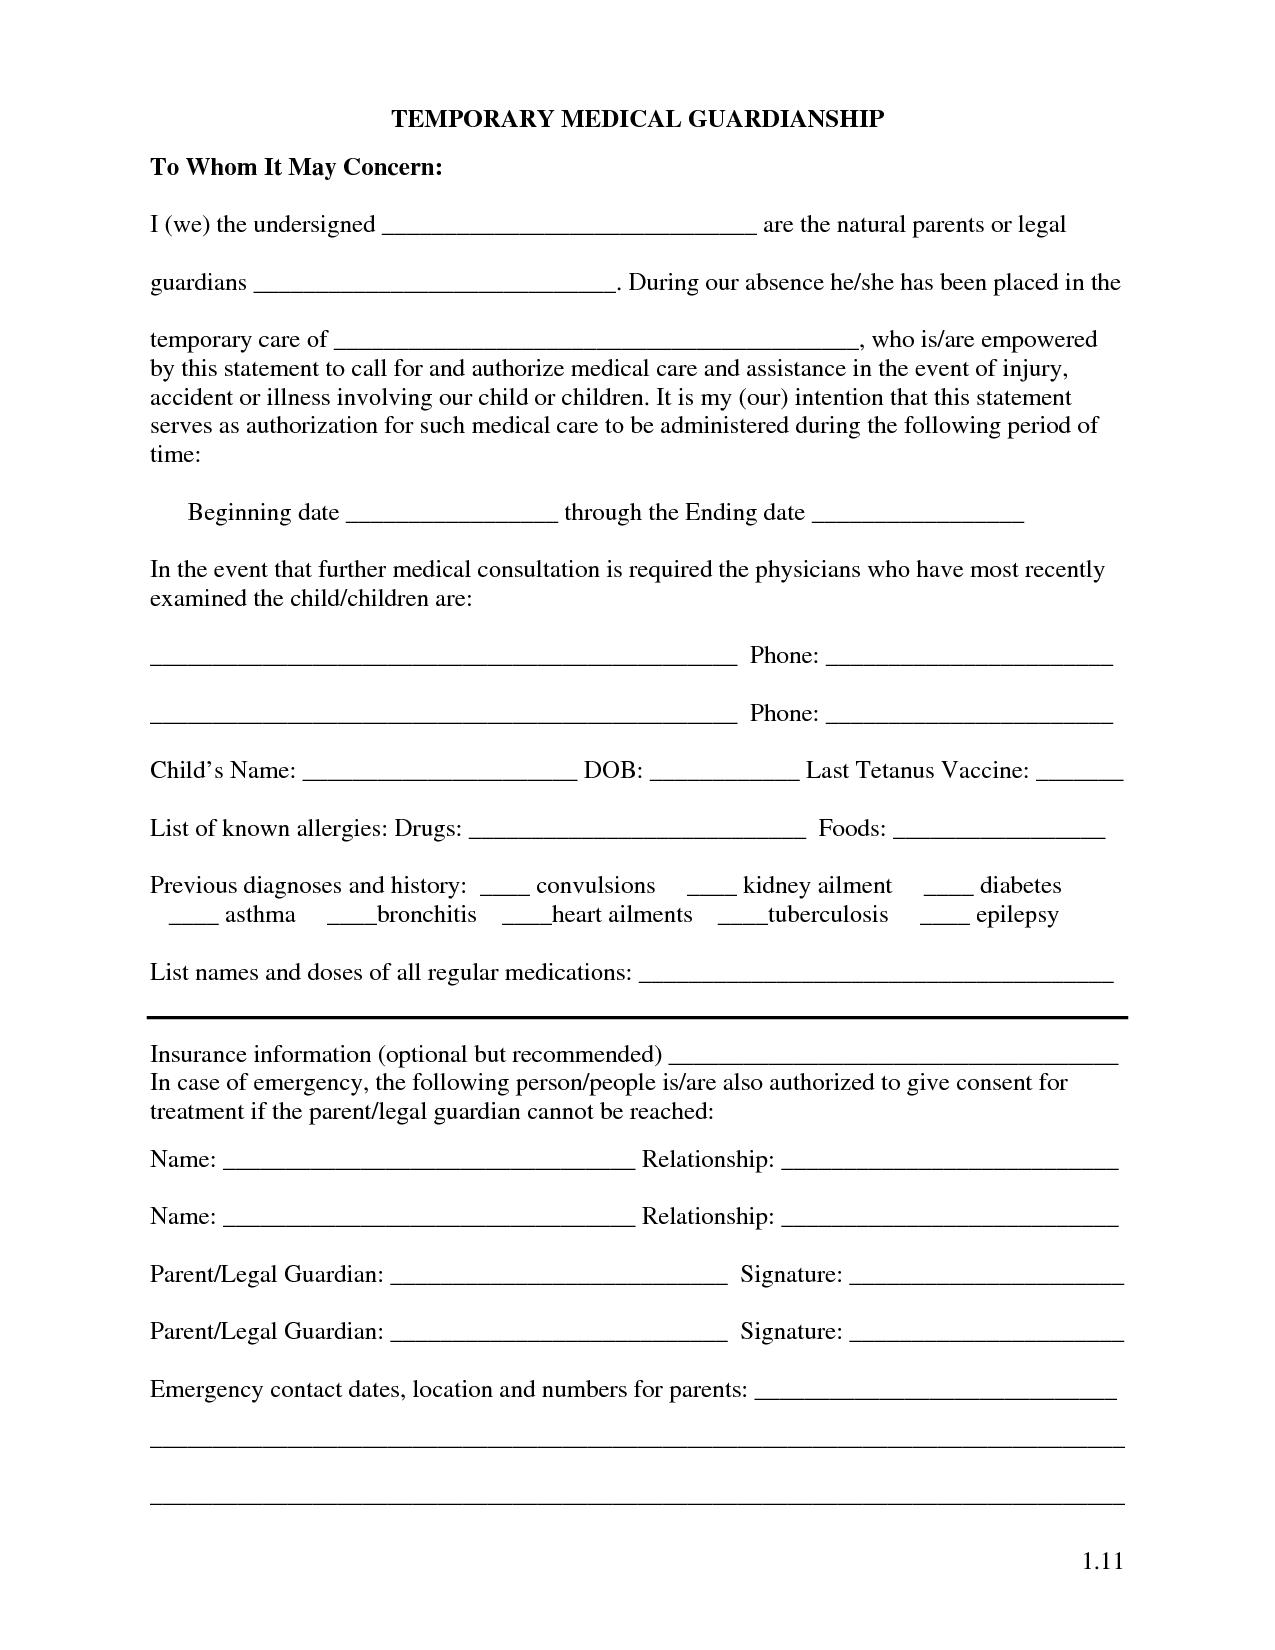 Free Printable Temporary Guardianship Forms | Forms - Free Printable Child Custody Forms